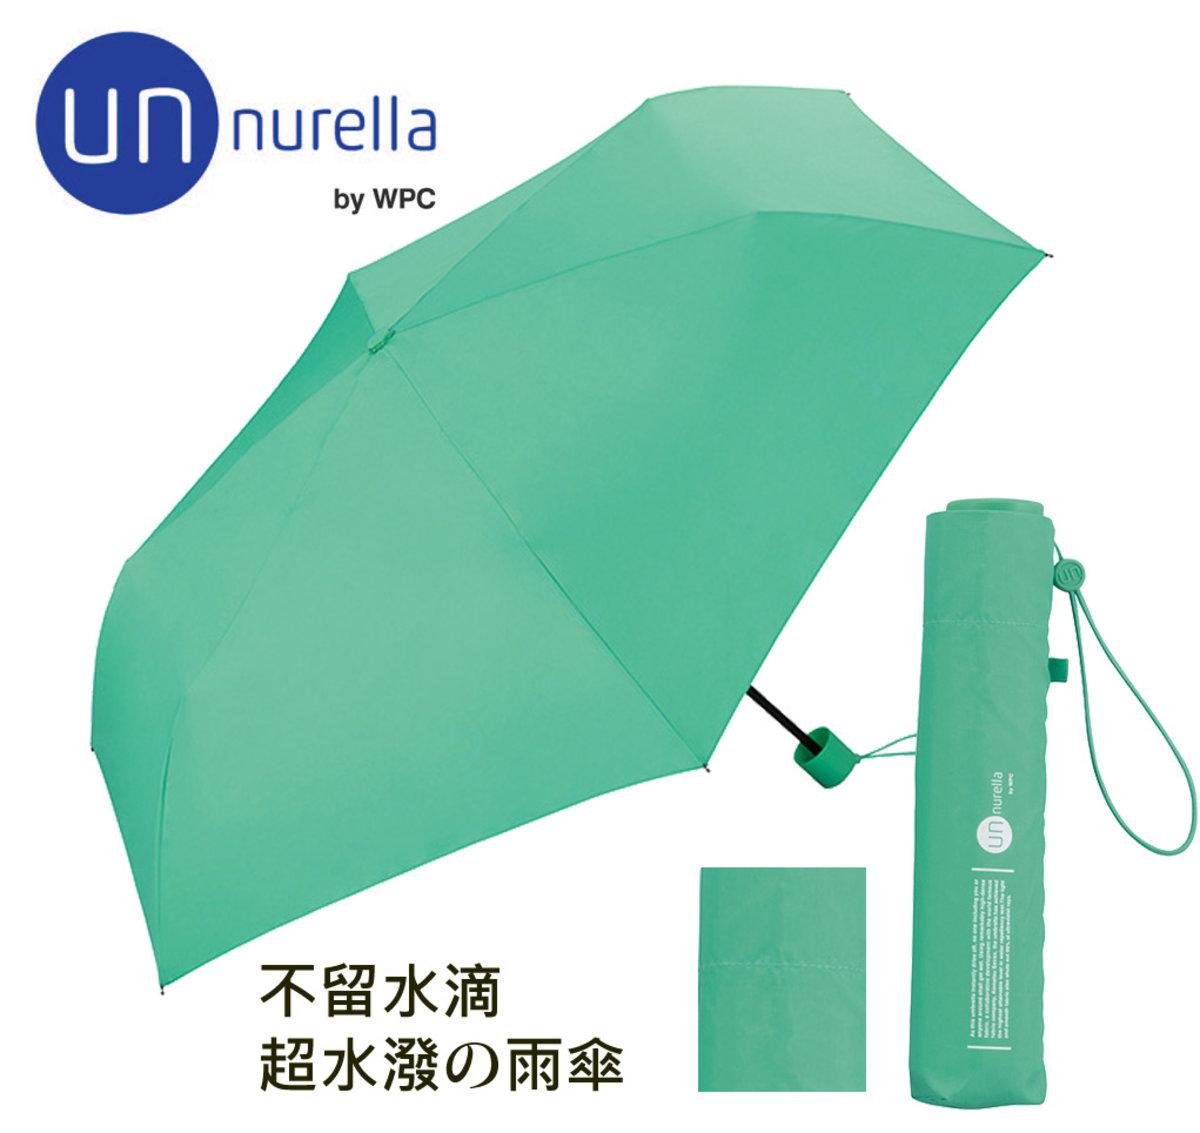 Clear all rain drop in a second ‧ Umbrella specialist from Japan - Unnurella by WPC UN-106-GR Folding Umbrella